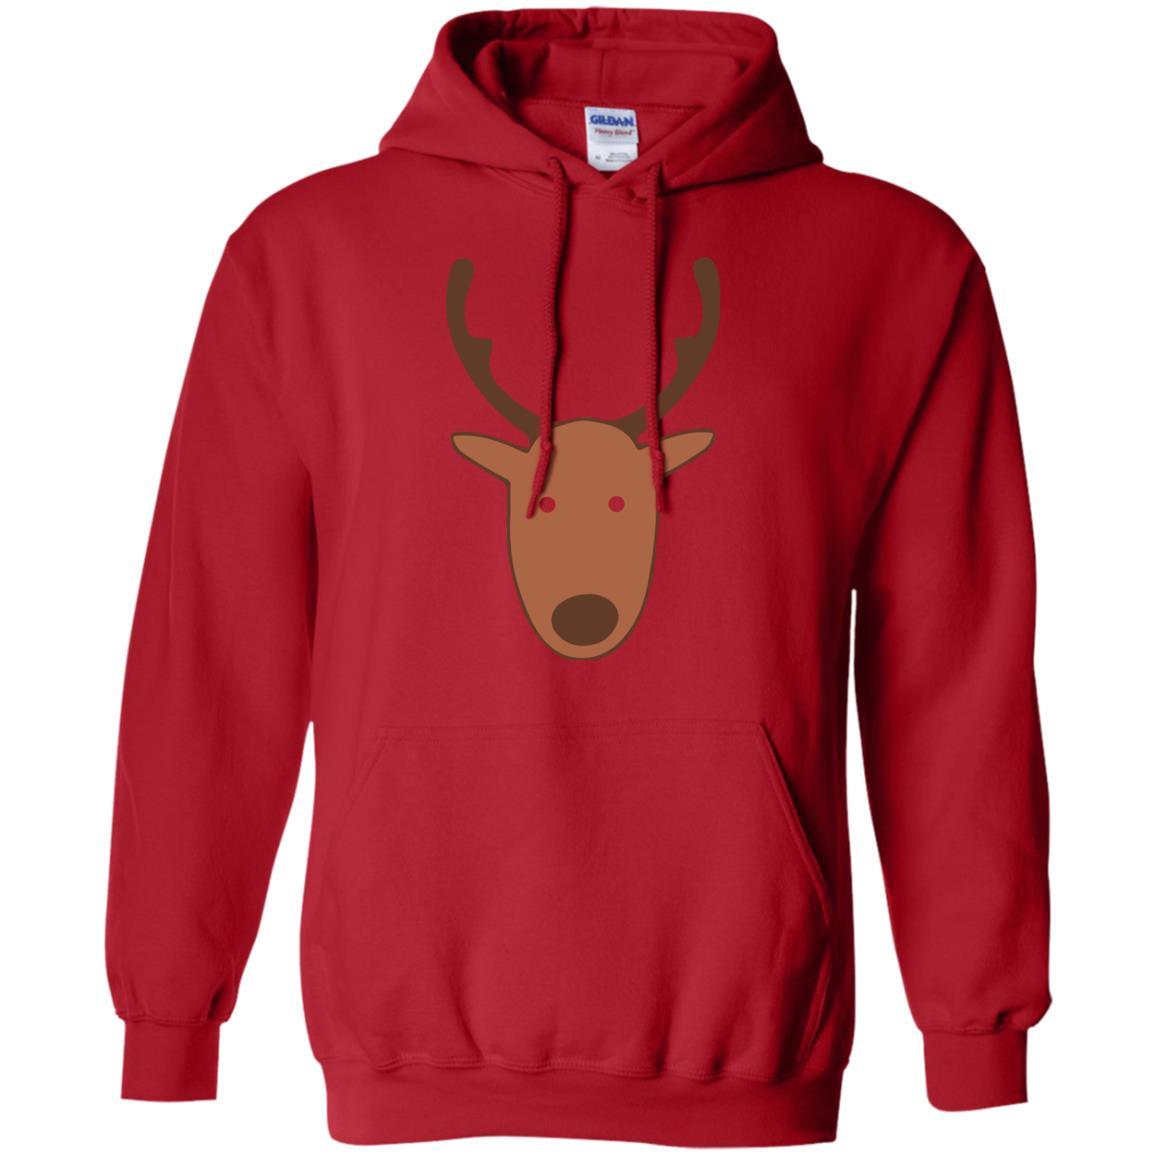 image 4772 - Tina Belcher Reindeer Christmas Sweater, Shirt, Hoodie